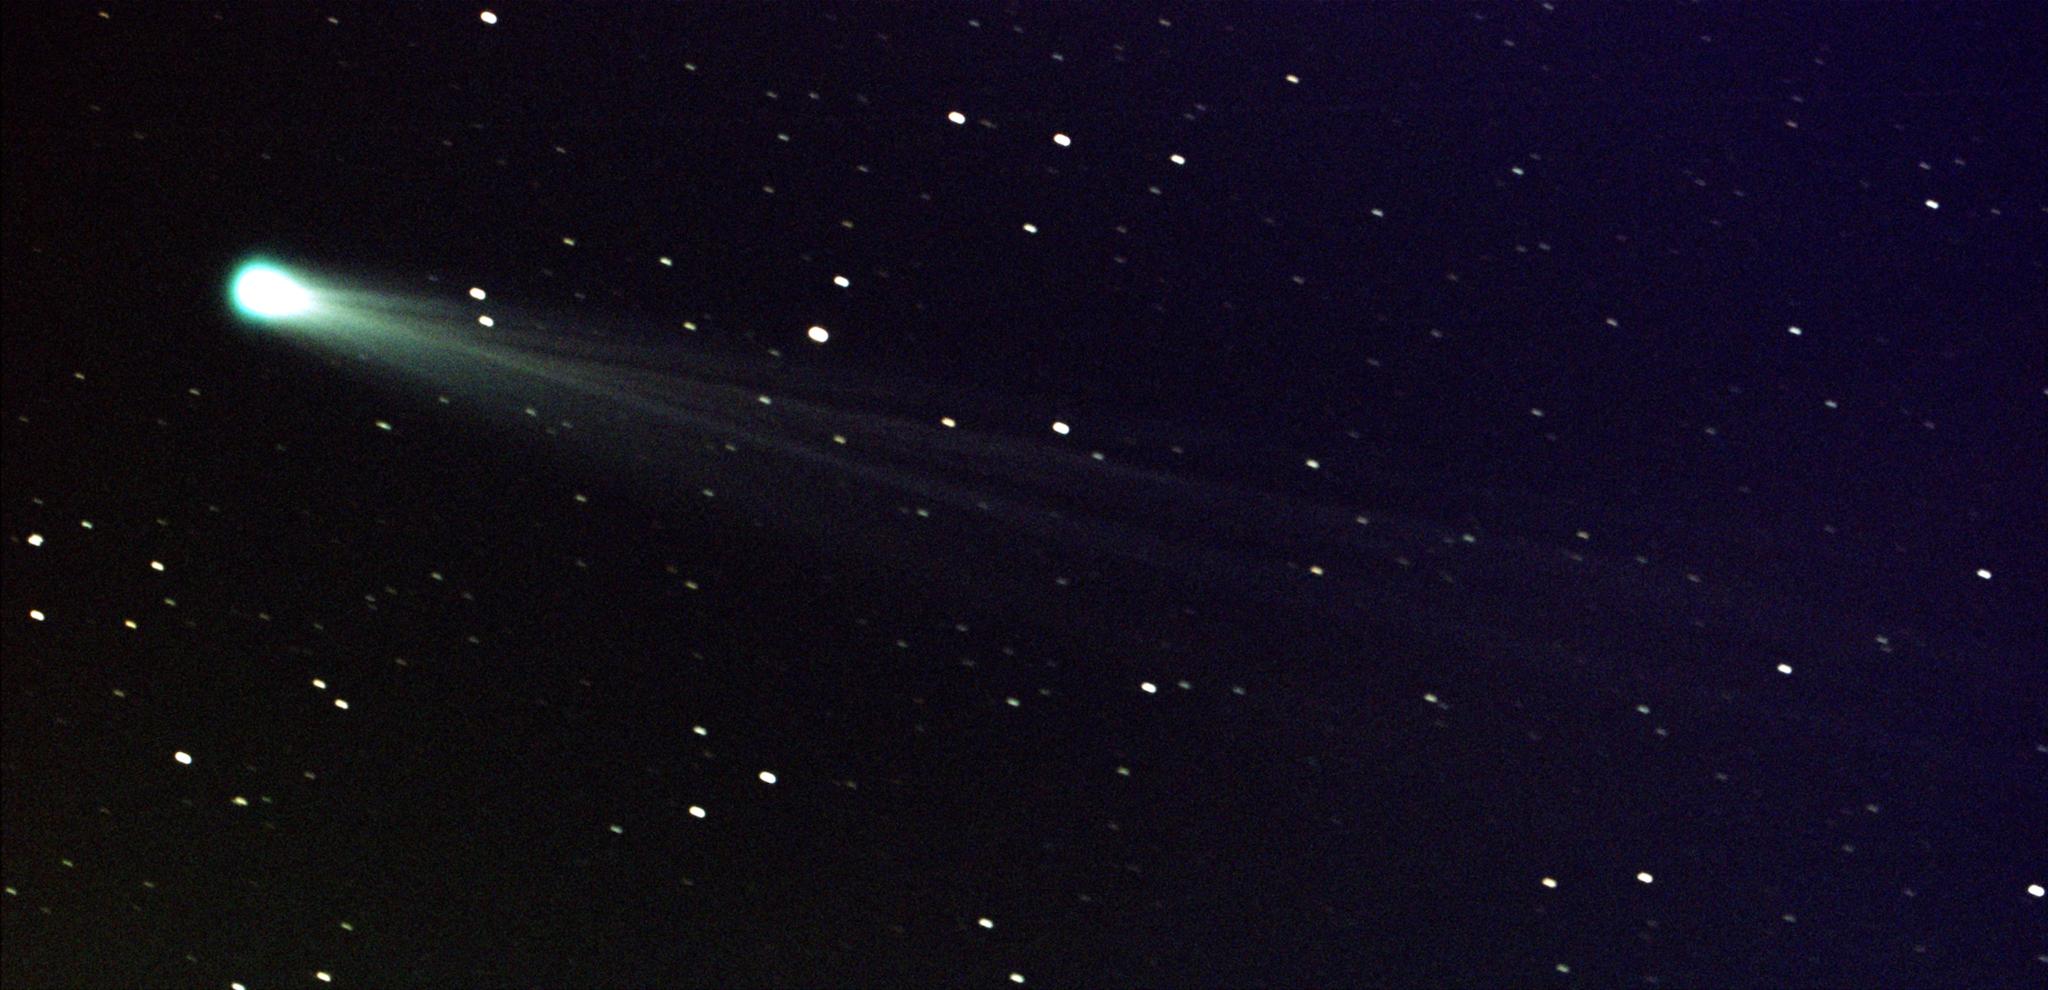 File:Comet ISON Streaks Toward the Sun.png - Wikimedia Commons